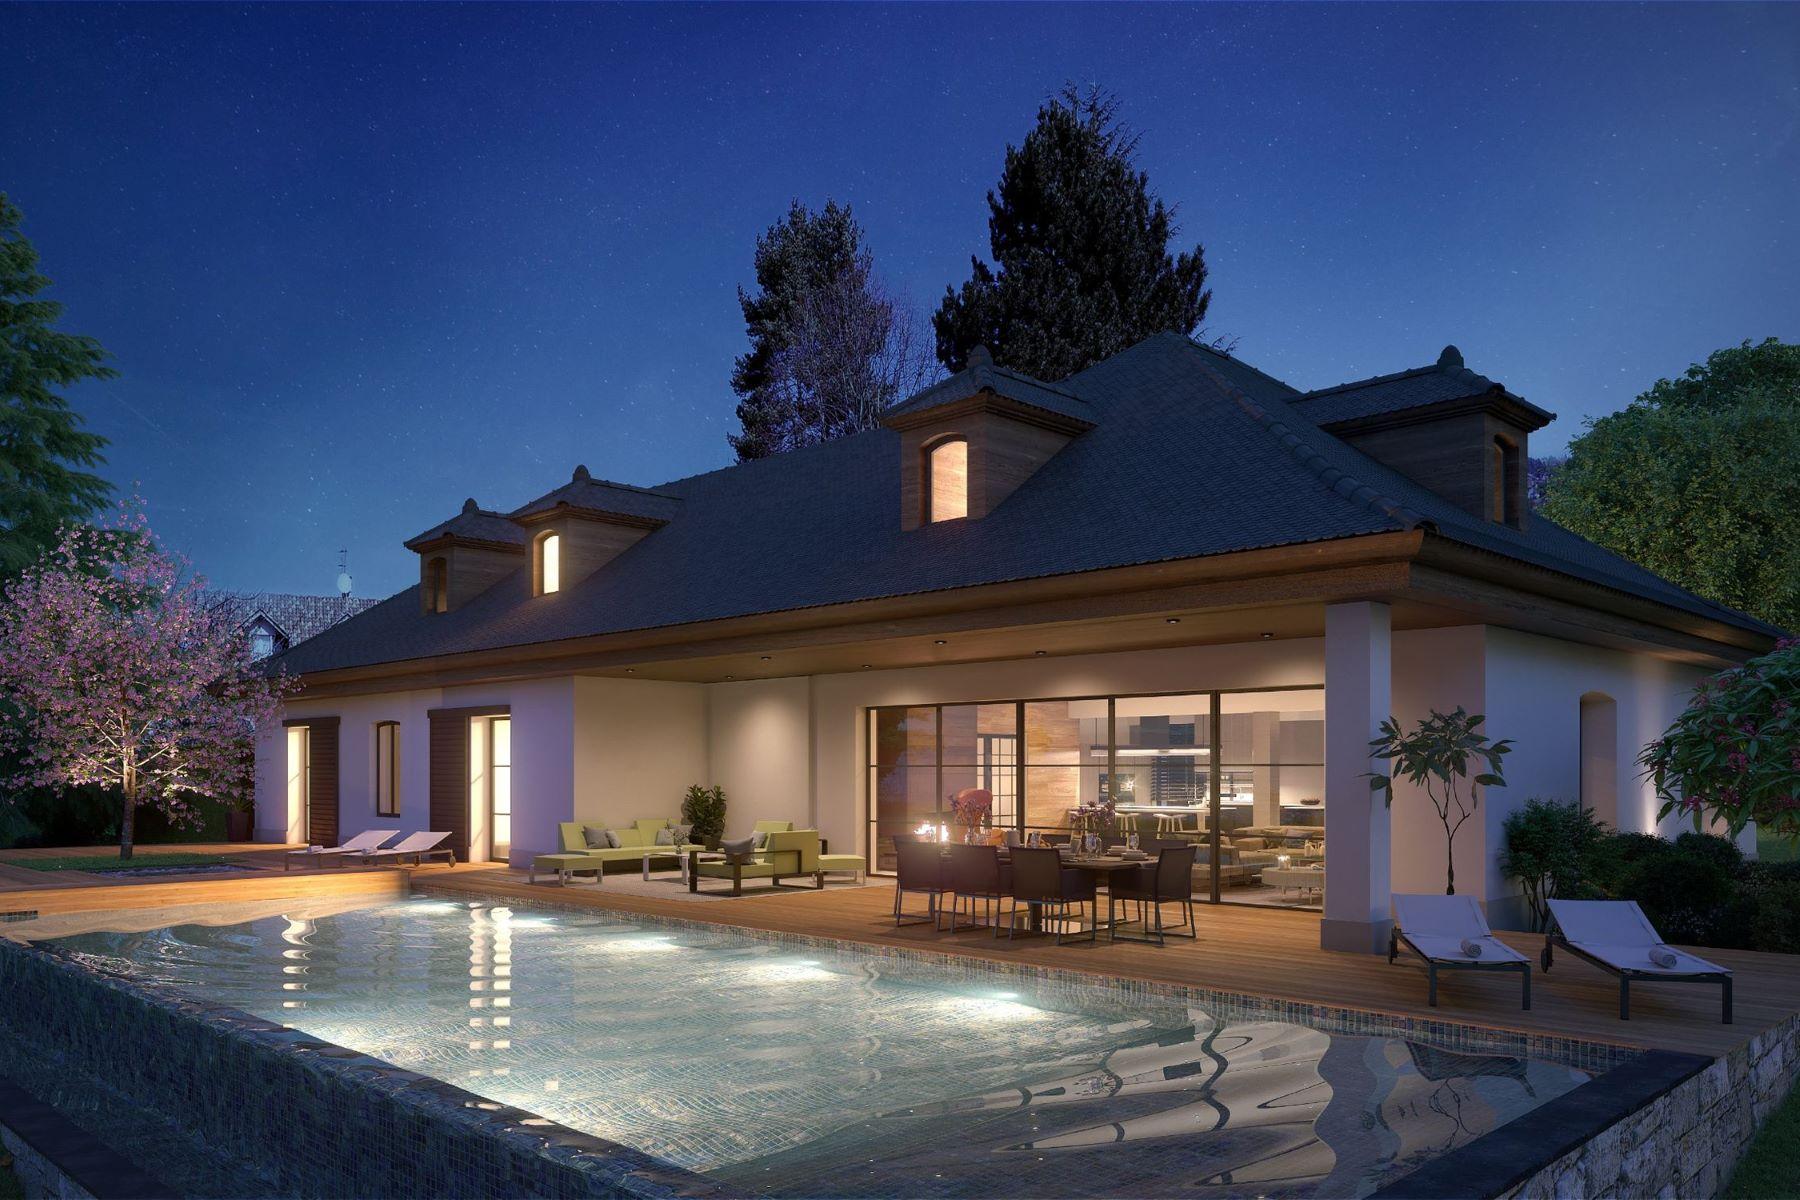 Single Family Home for Sale at SALE OF PRESTIGIOUS VILLA Cranves Sales, Rhone-Alpes 74380 France